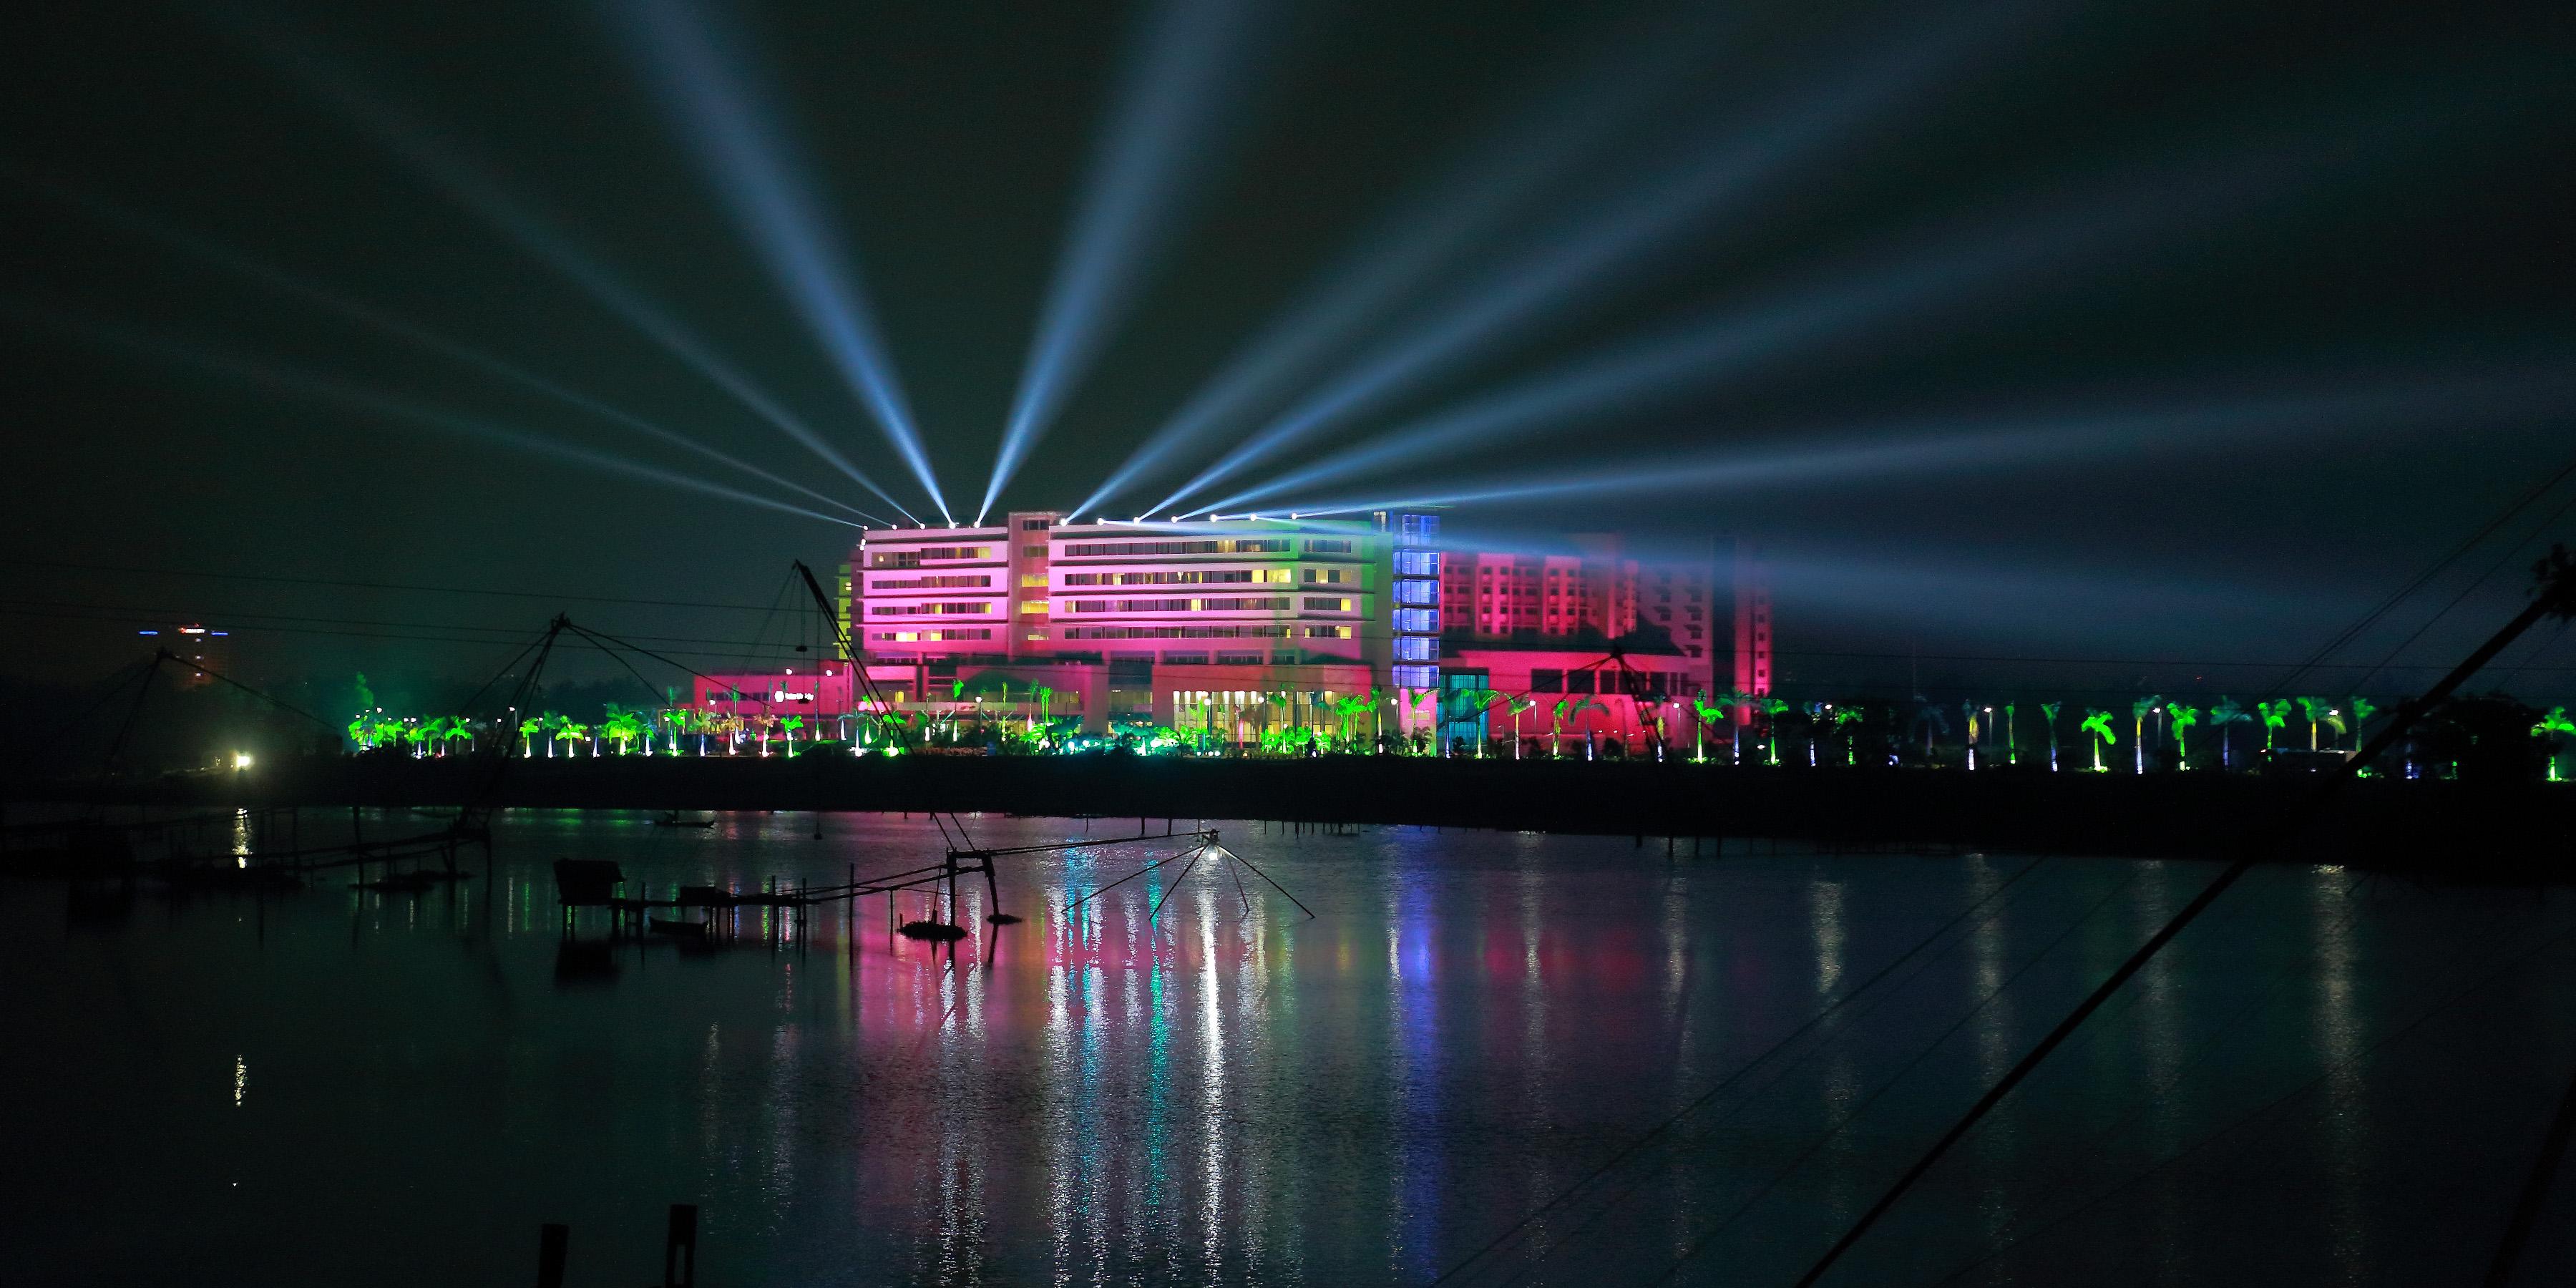 India-luxury-hospitals-photos